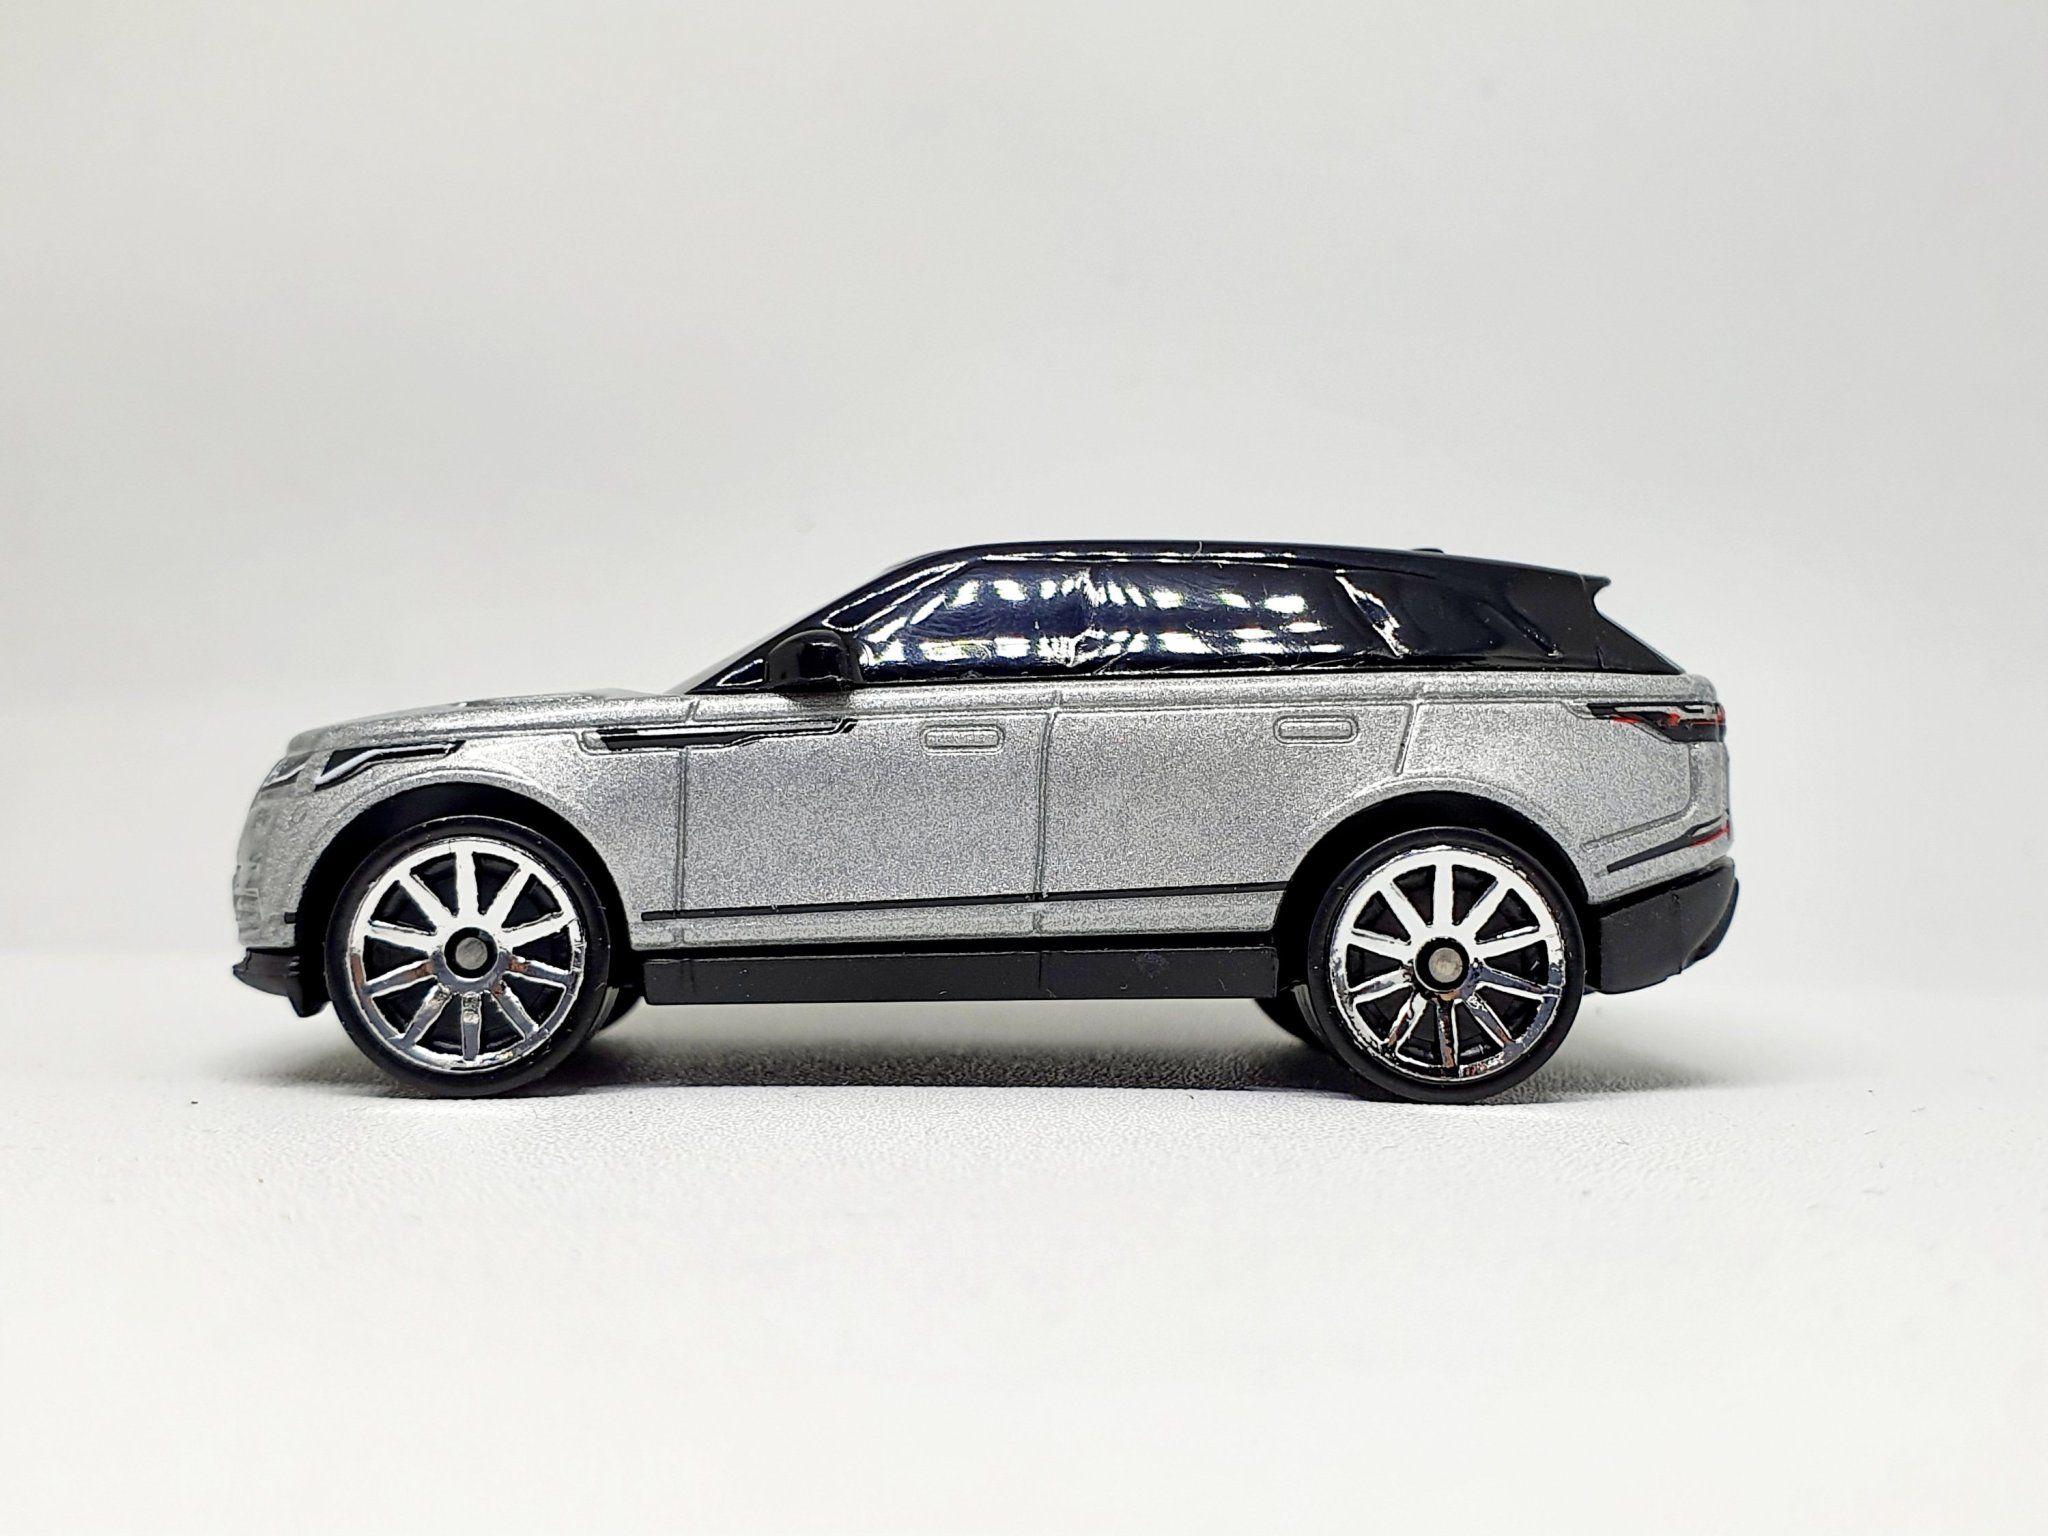 Hot Wheels 2020 Range Rover Velar In Silver Diecastgraphy Mobil Range Rover Hot Wheels Range Rover